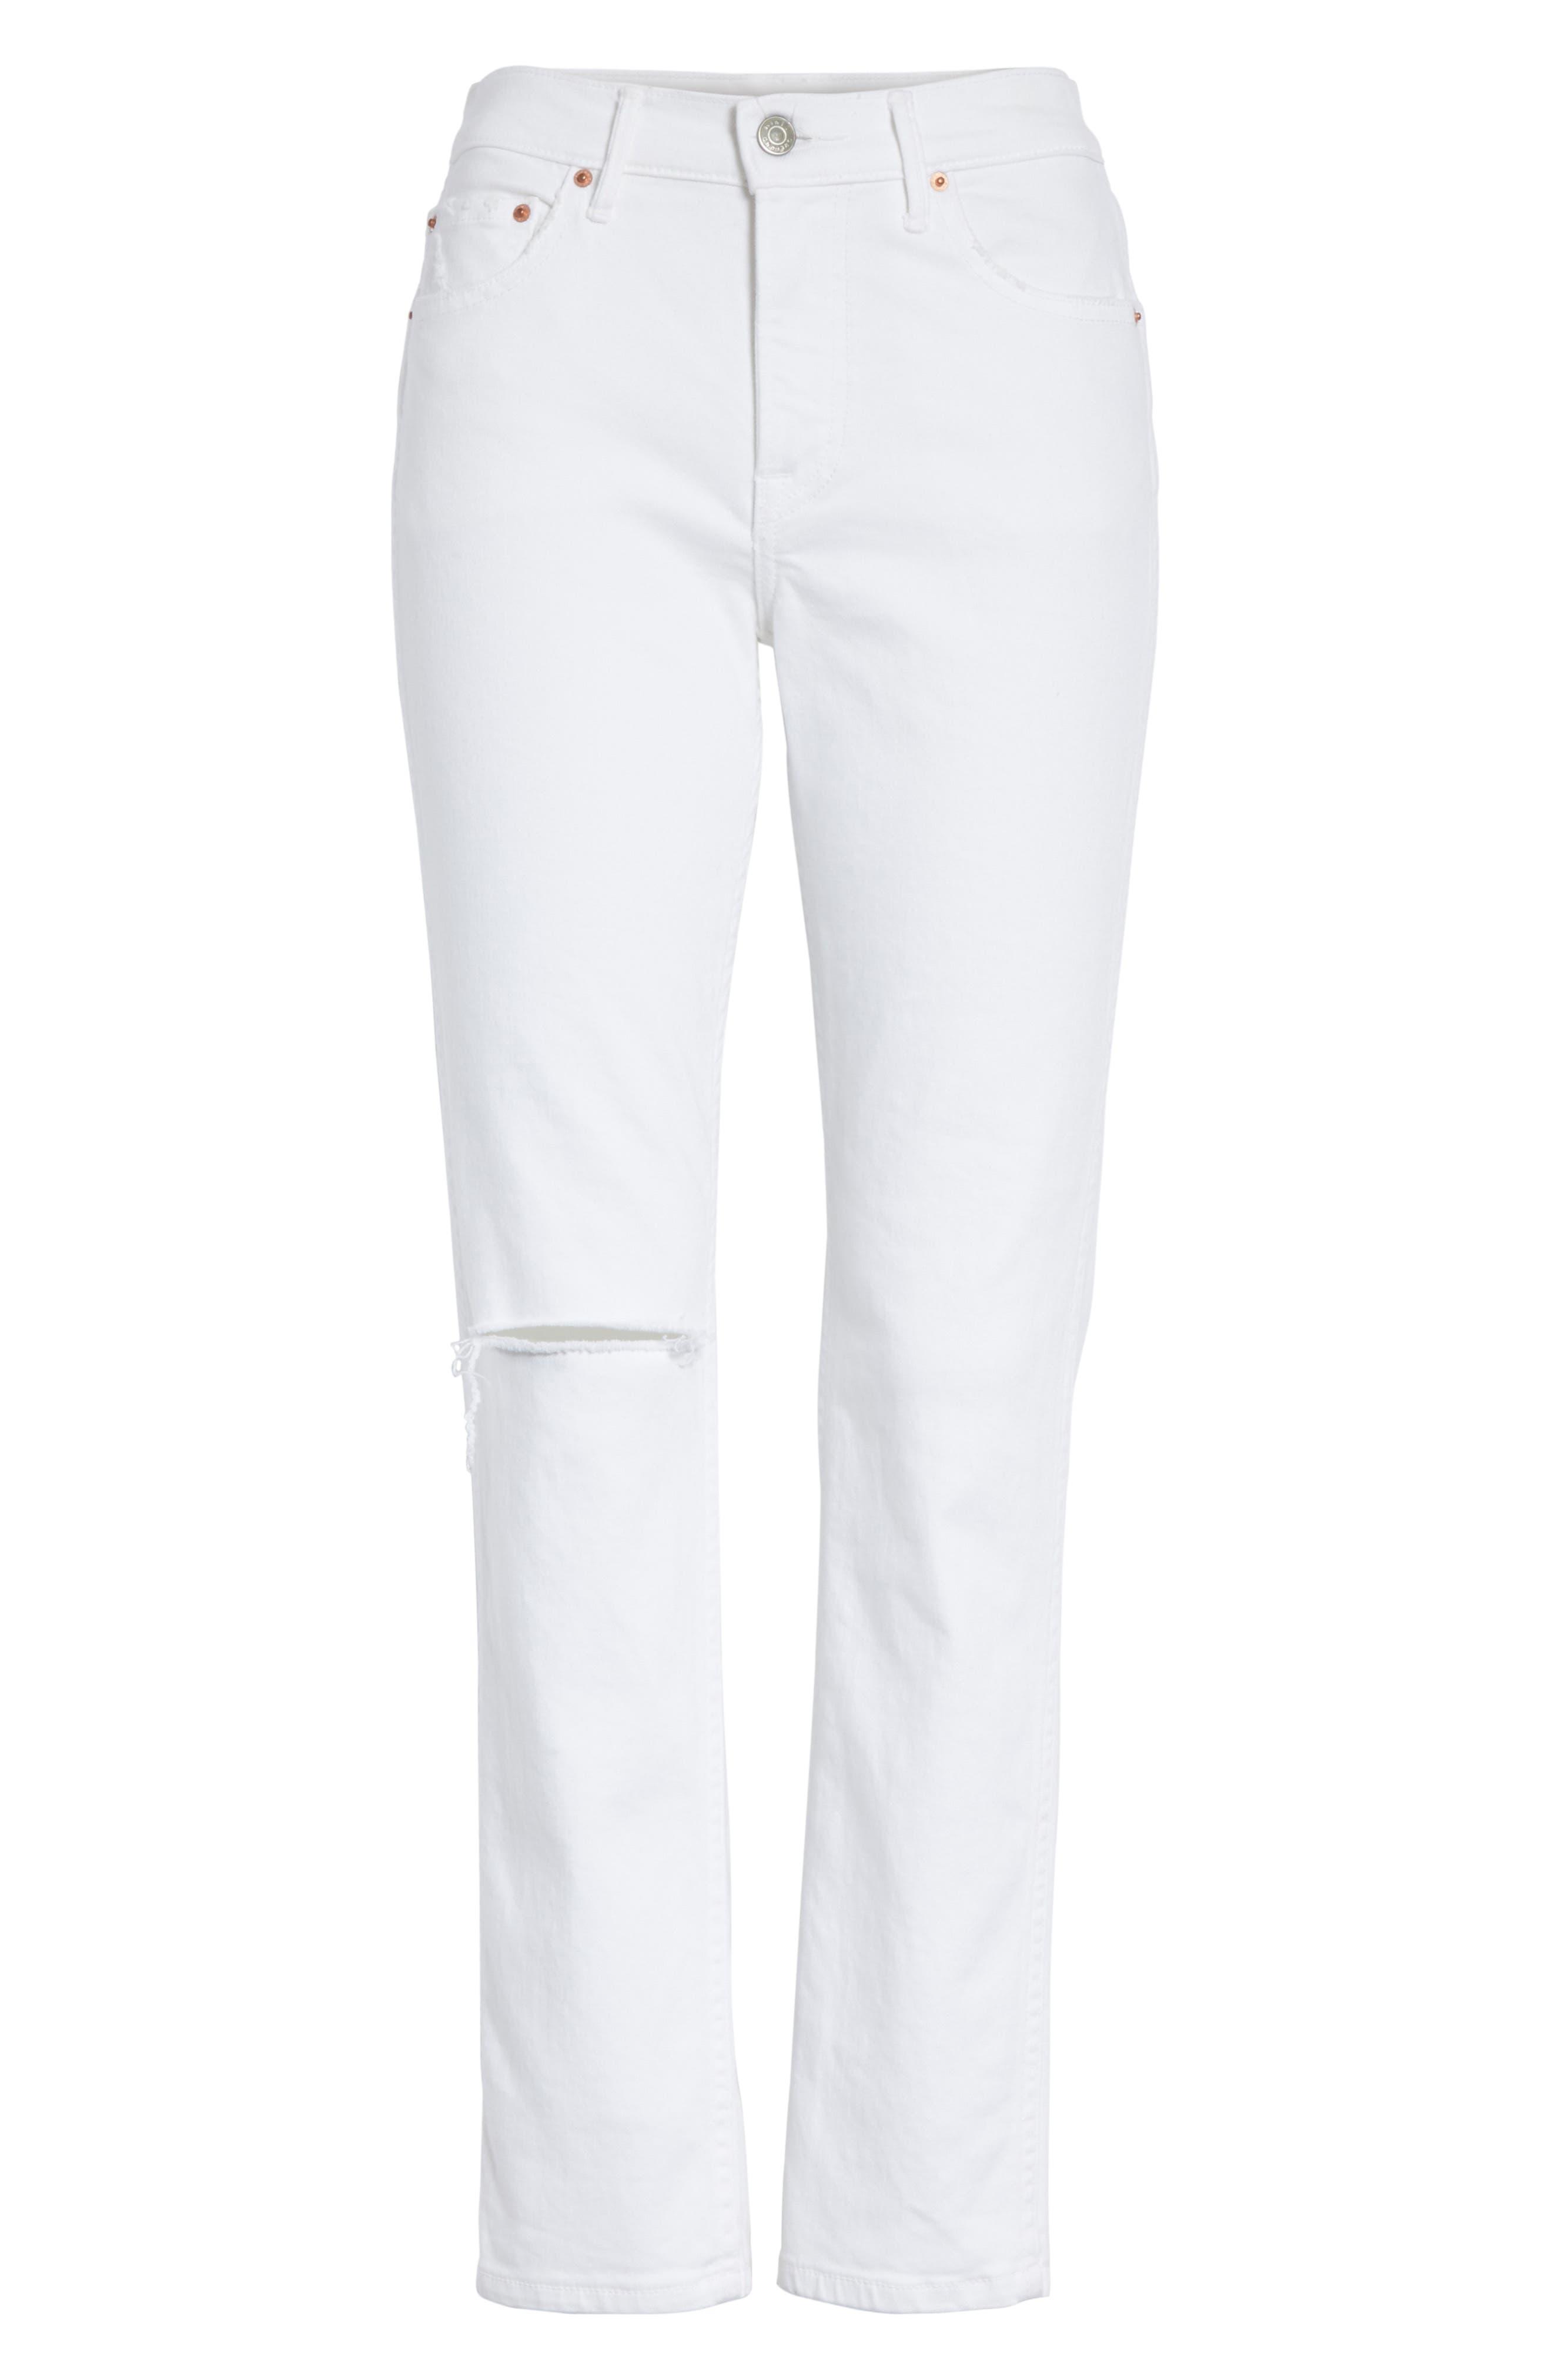 Naomi High Waist Skinny Jeans,                             Alternate thumbnail 6, color,                             100